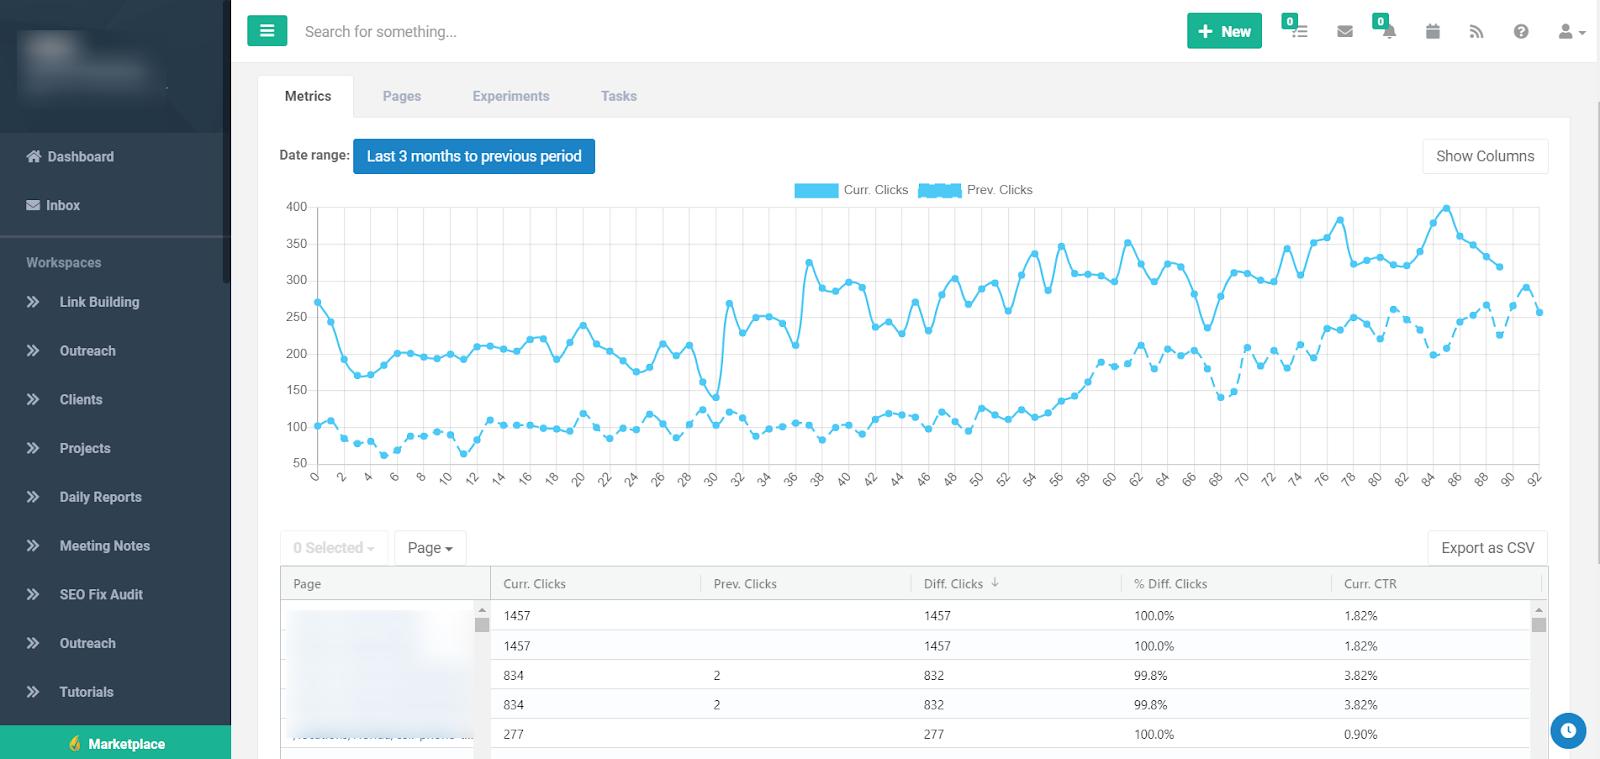 Using Digital Marketing Analytics Data for Actionable Insights